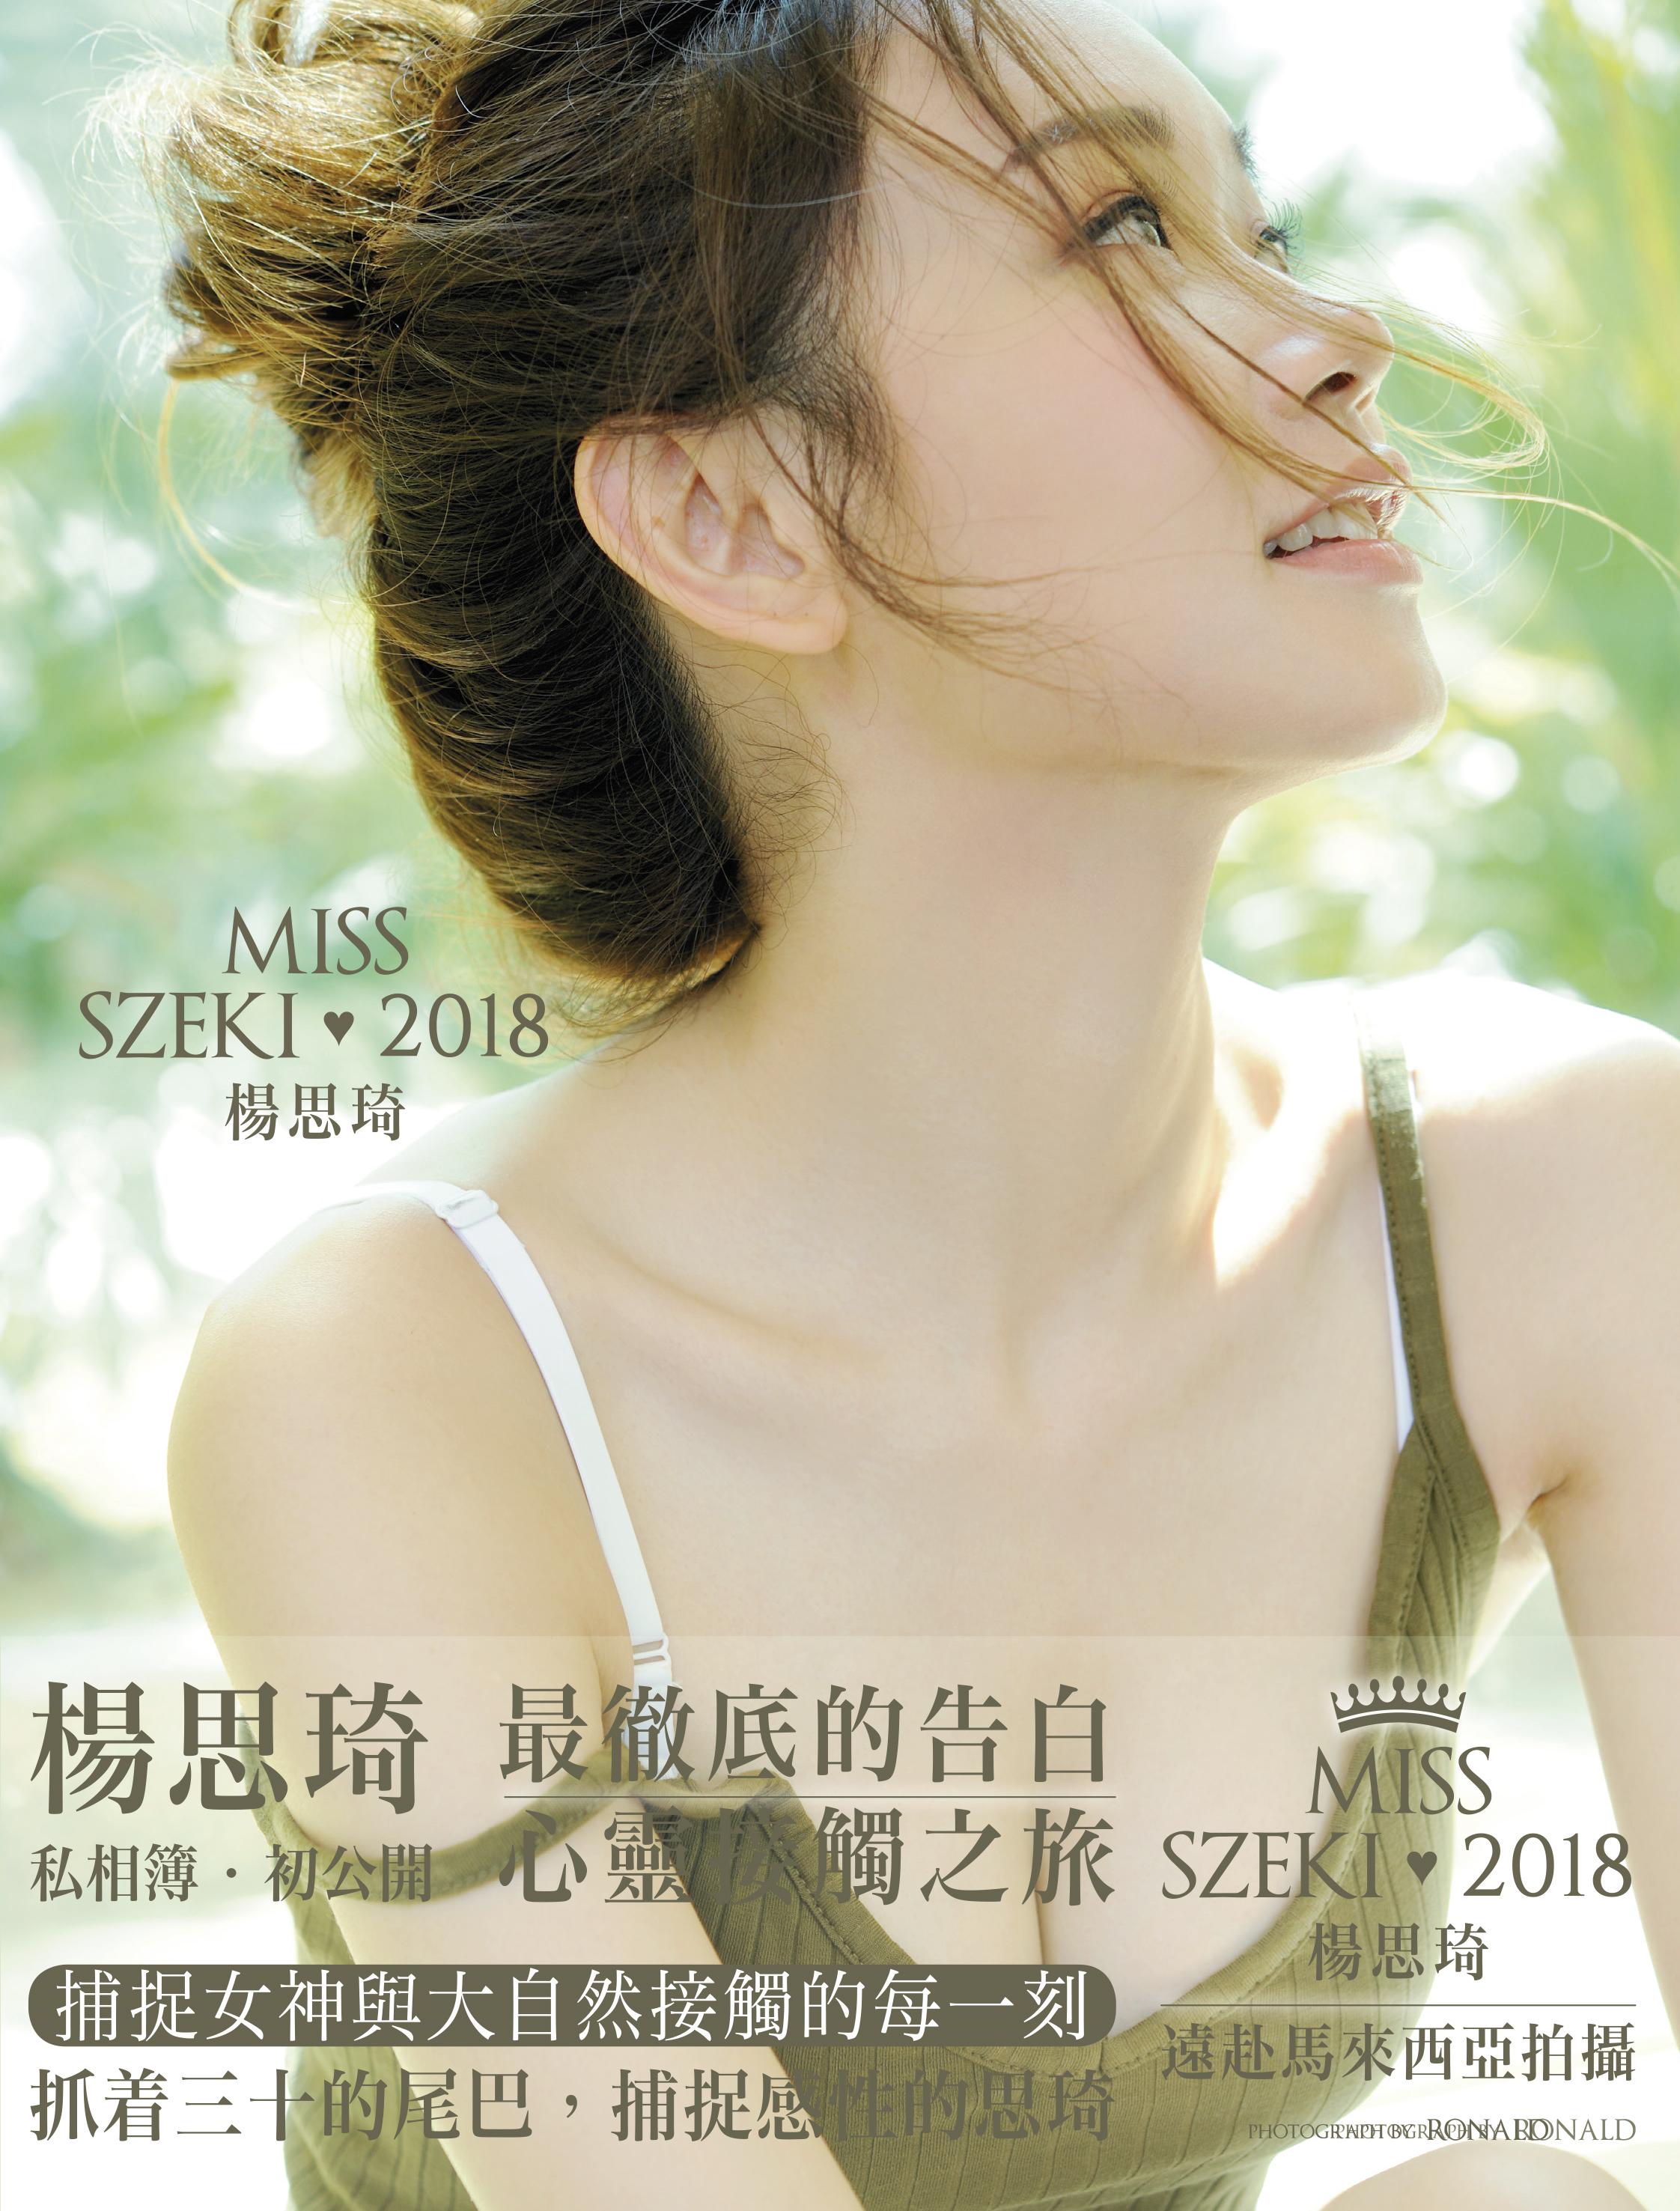 szeki_cover_a